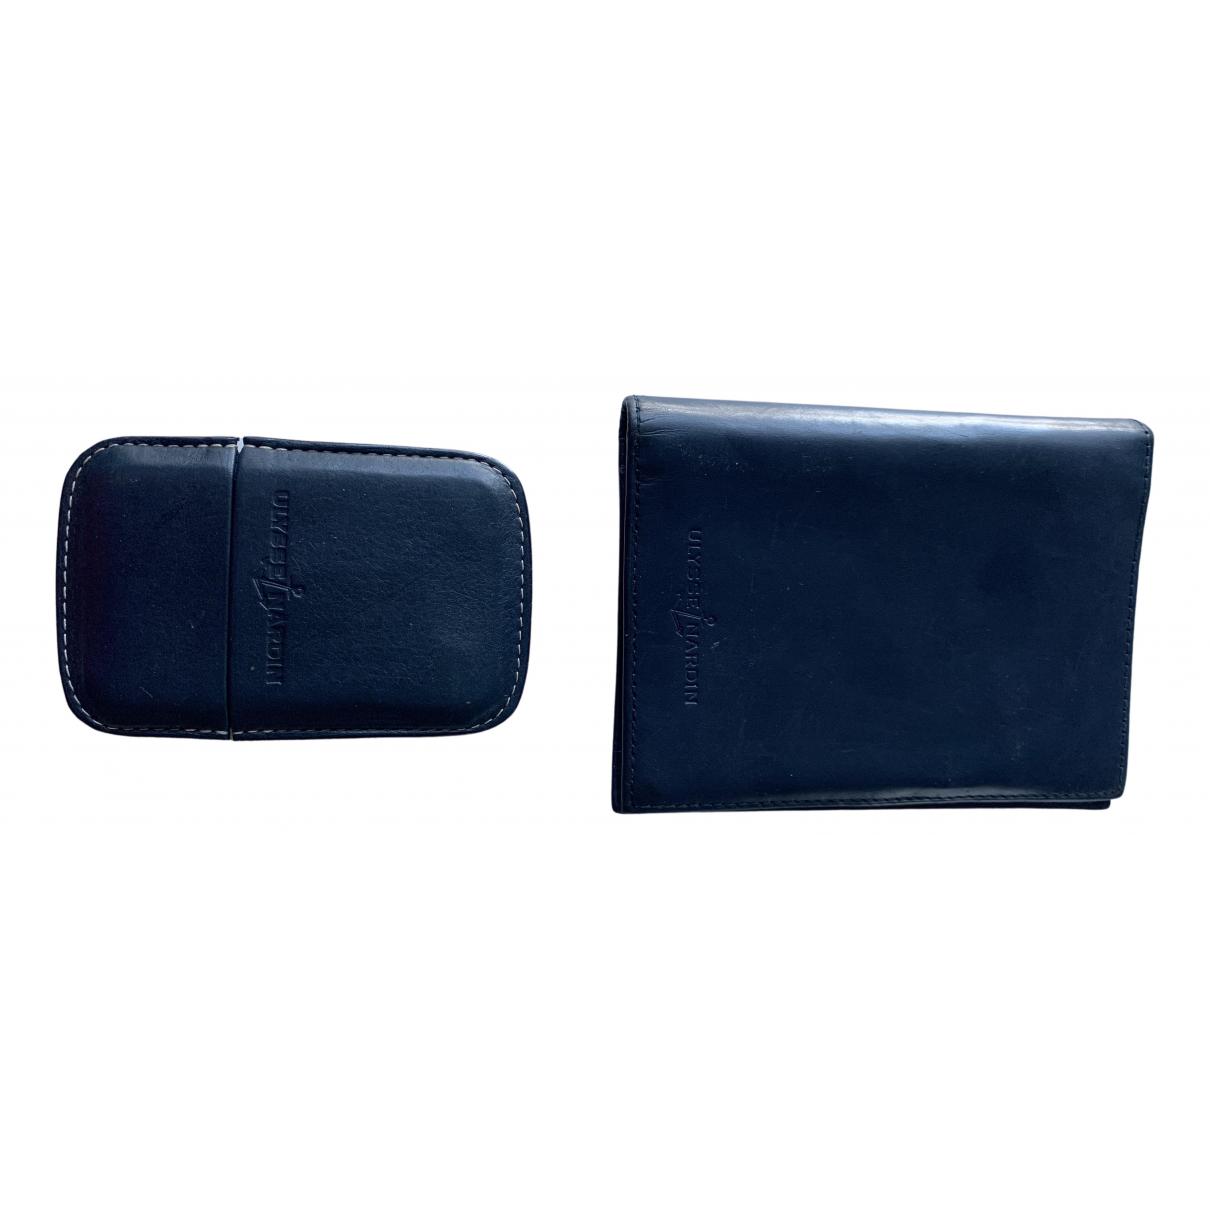 Ulysse Nardin \N Blue Leather Purses, wallet & cases for Women \N